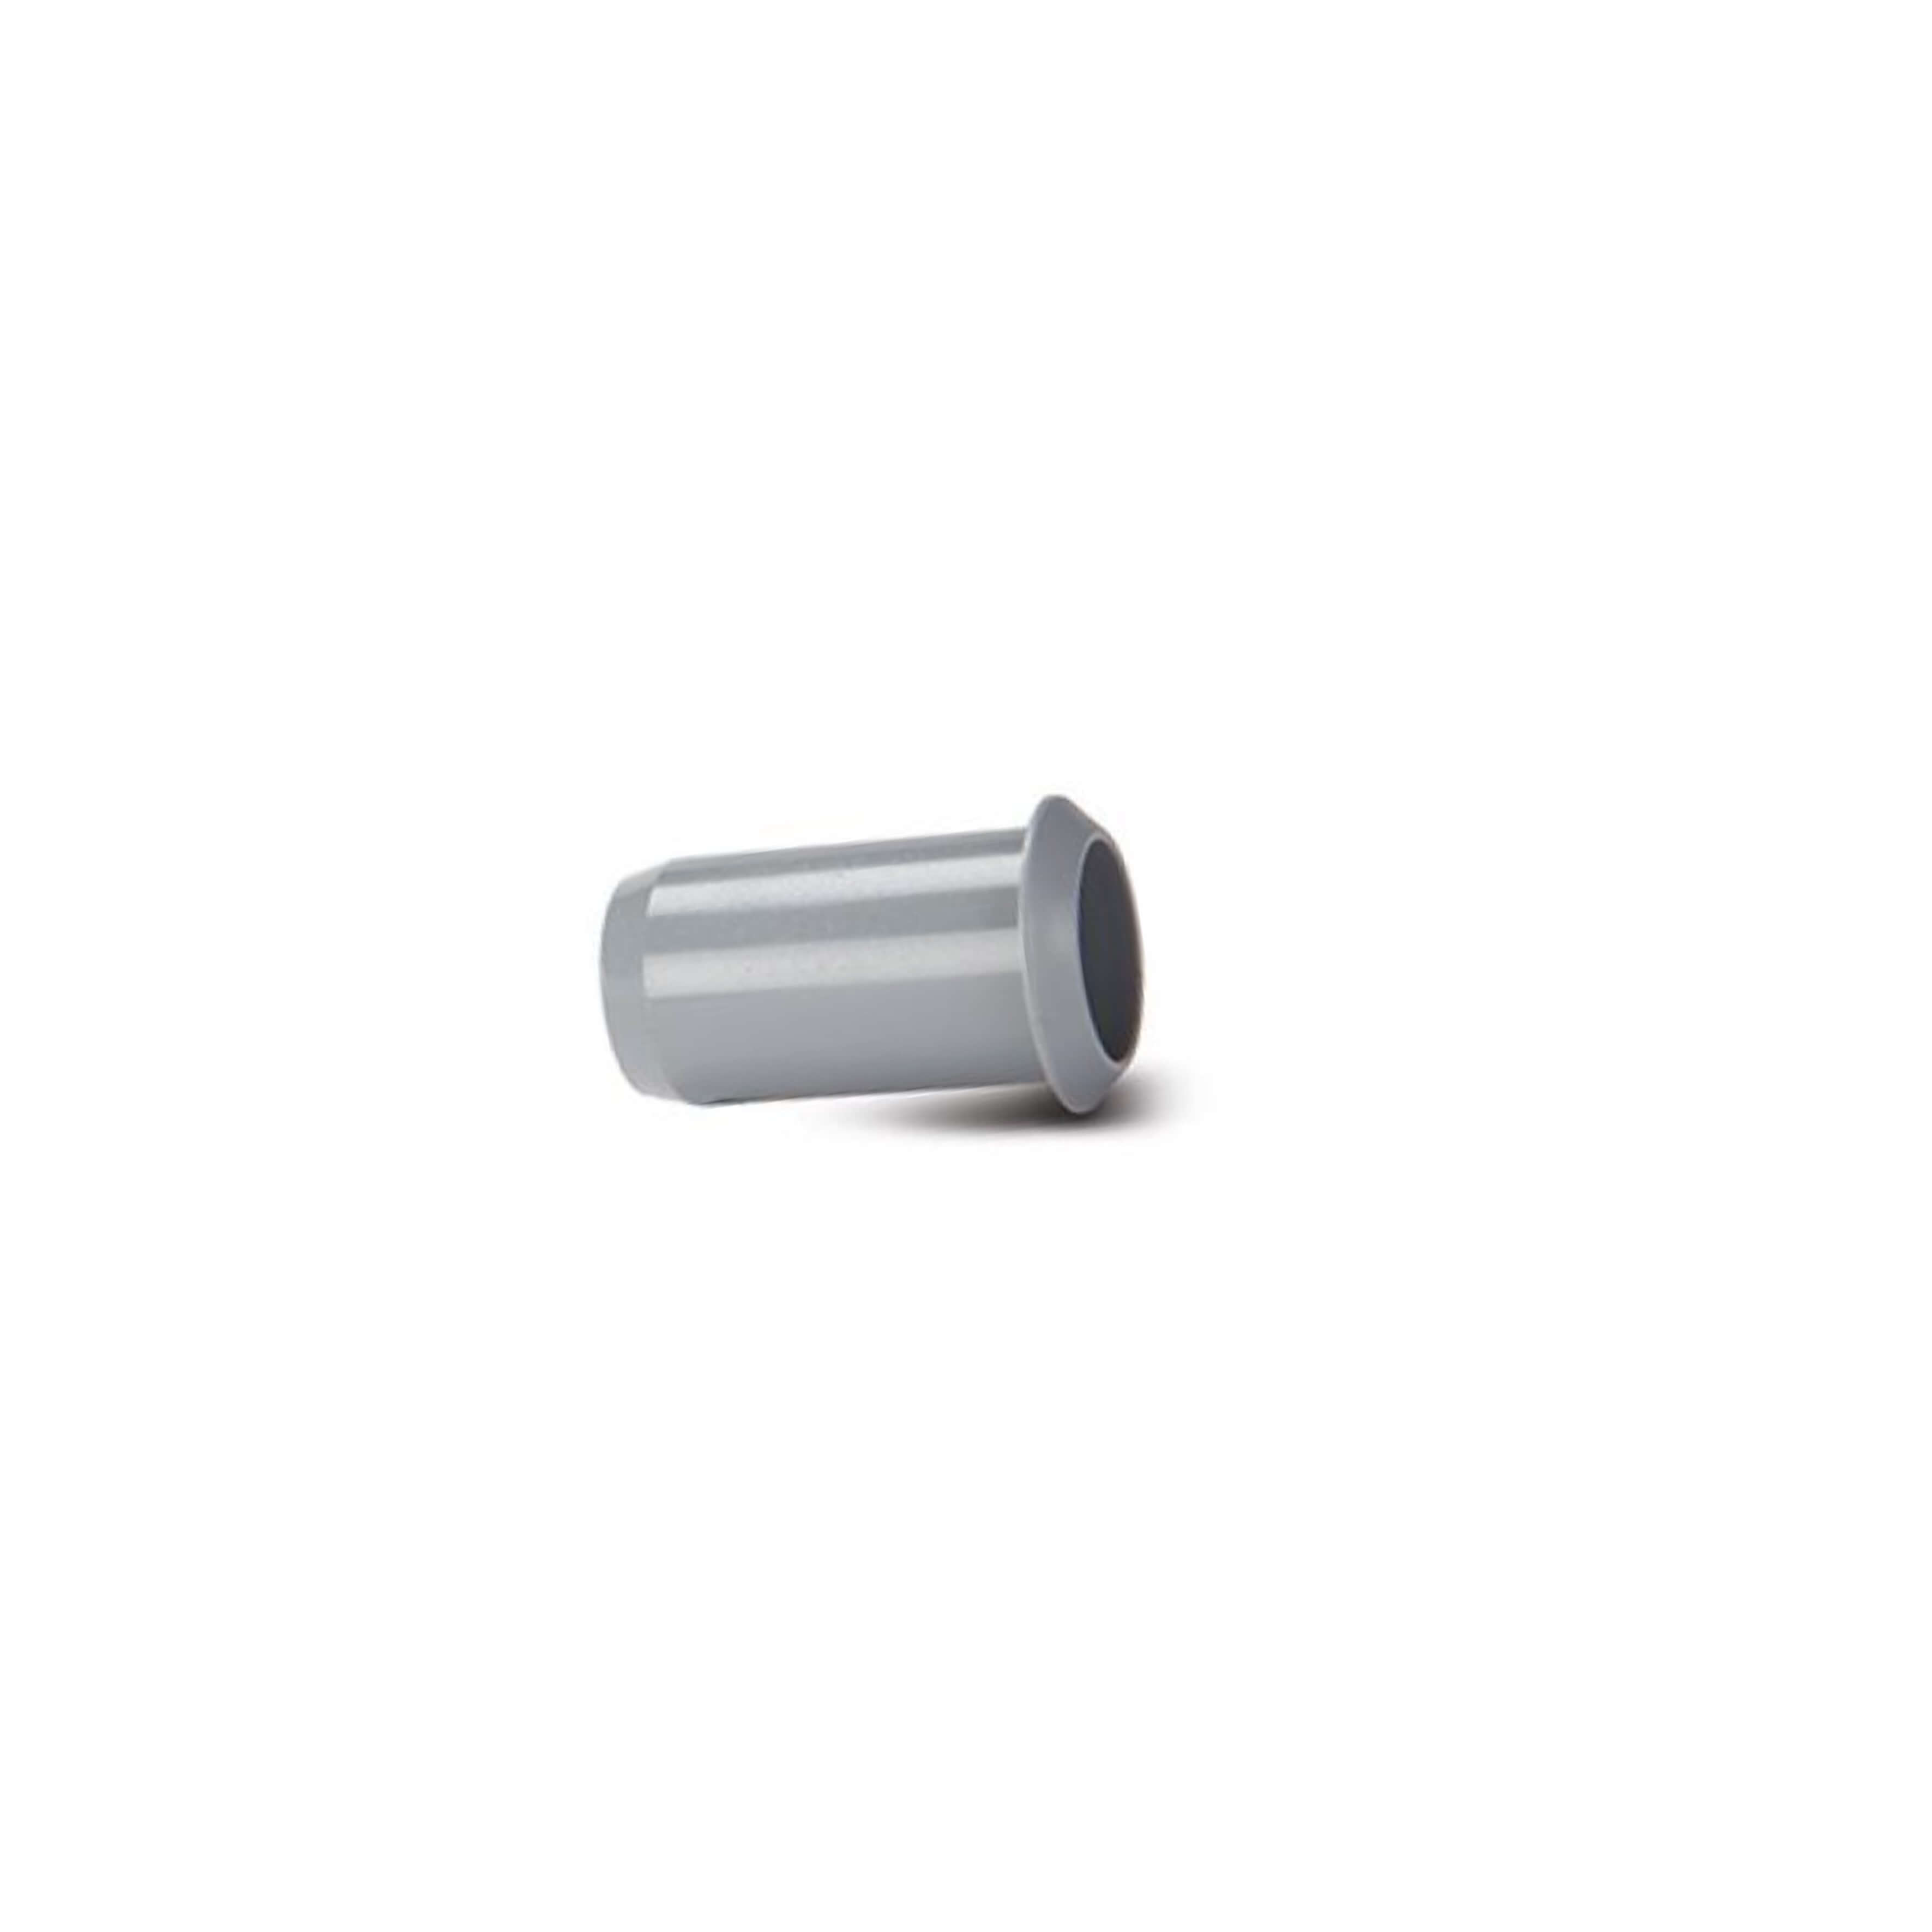 Polyfast 25mm Pipe Insert 46425